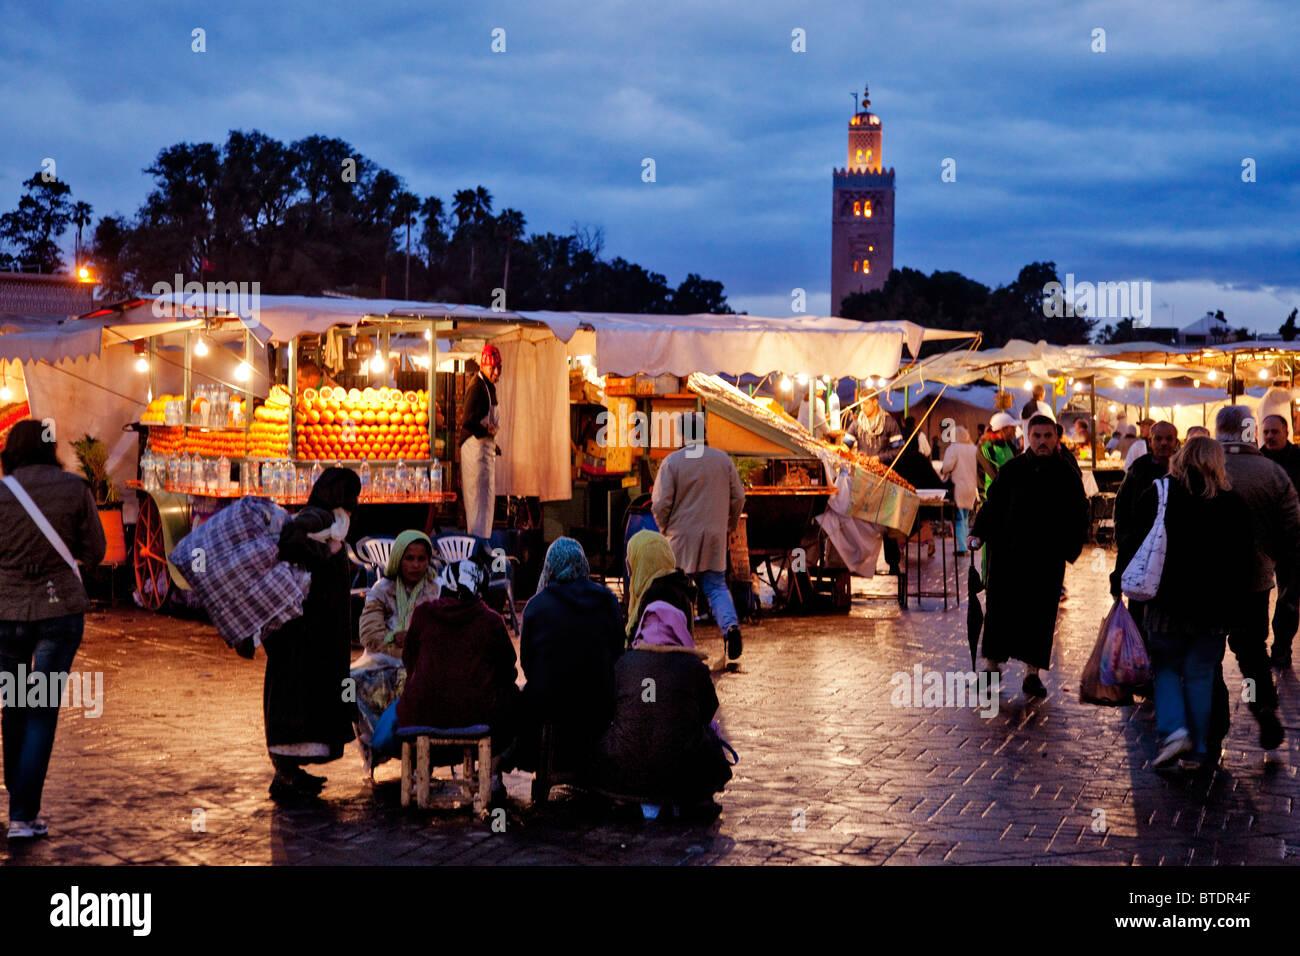 Evening festivities at Marrakech Market or Medina Square - Stock Image